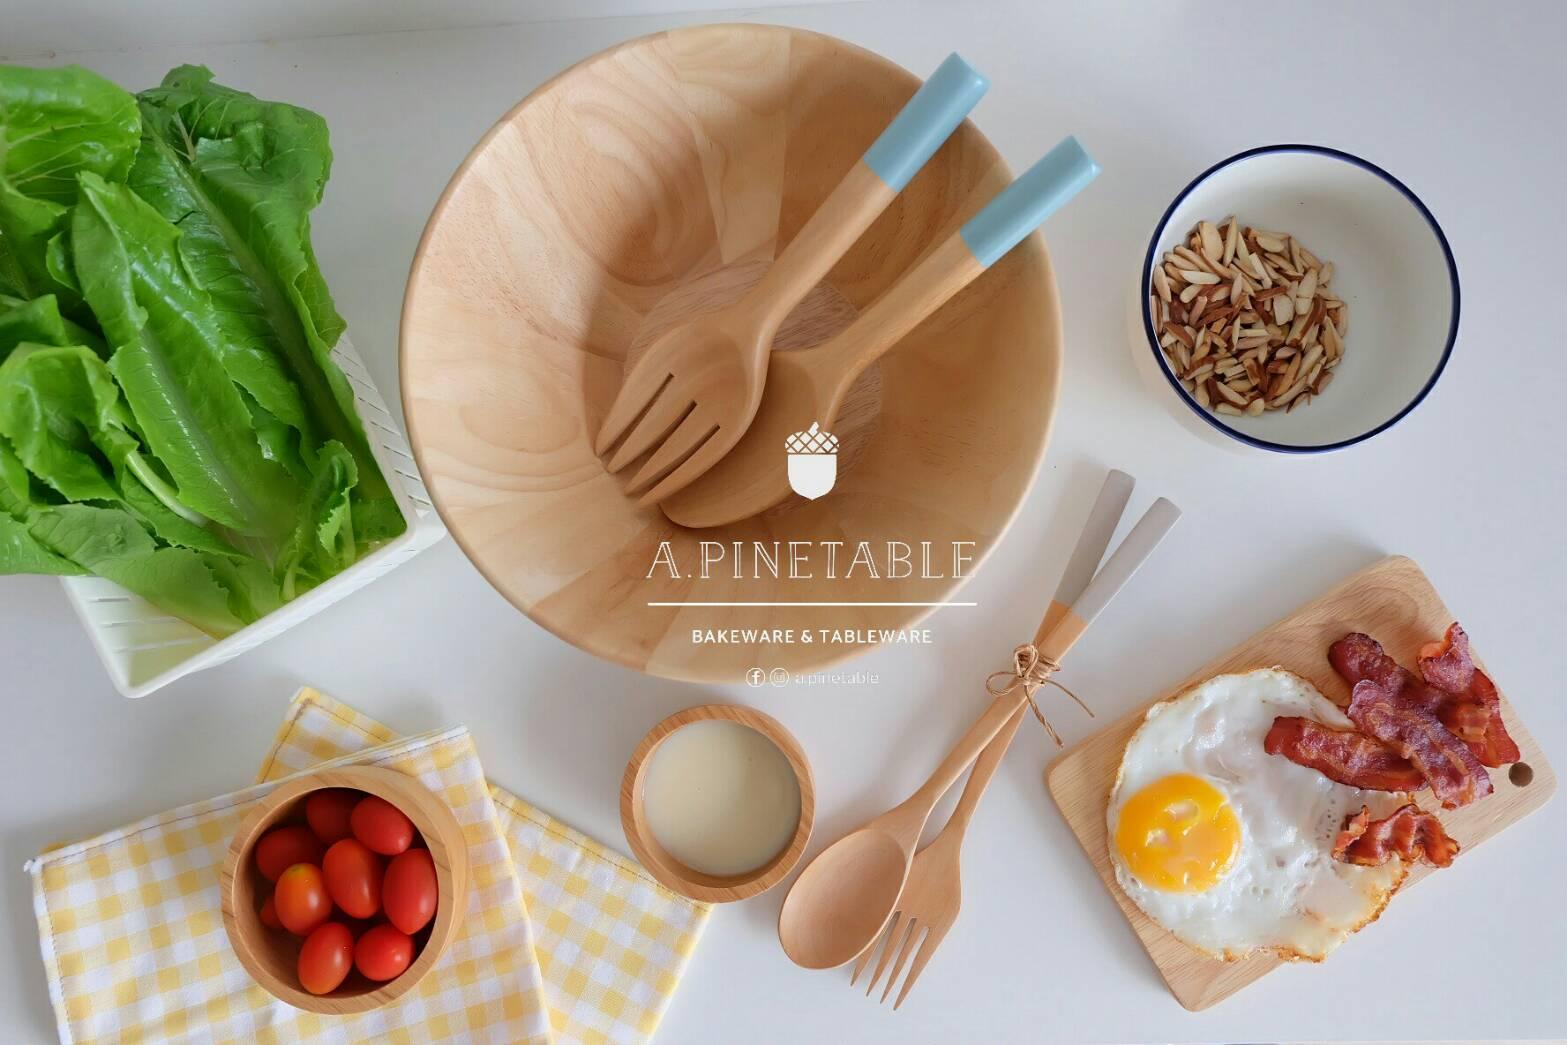 apinetable,gift,newyeargift,woodenware,bowl,plate,tableware,kitchenware,homedecoration,kitchendecoration,zakka,homeidea